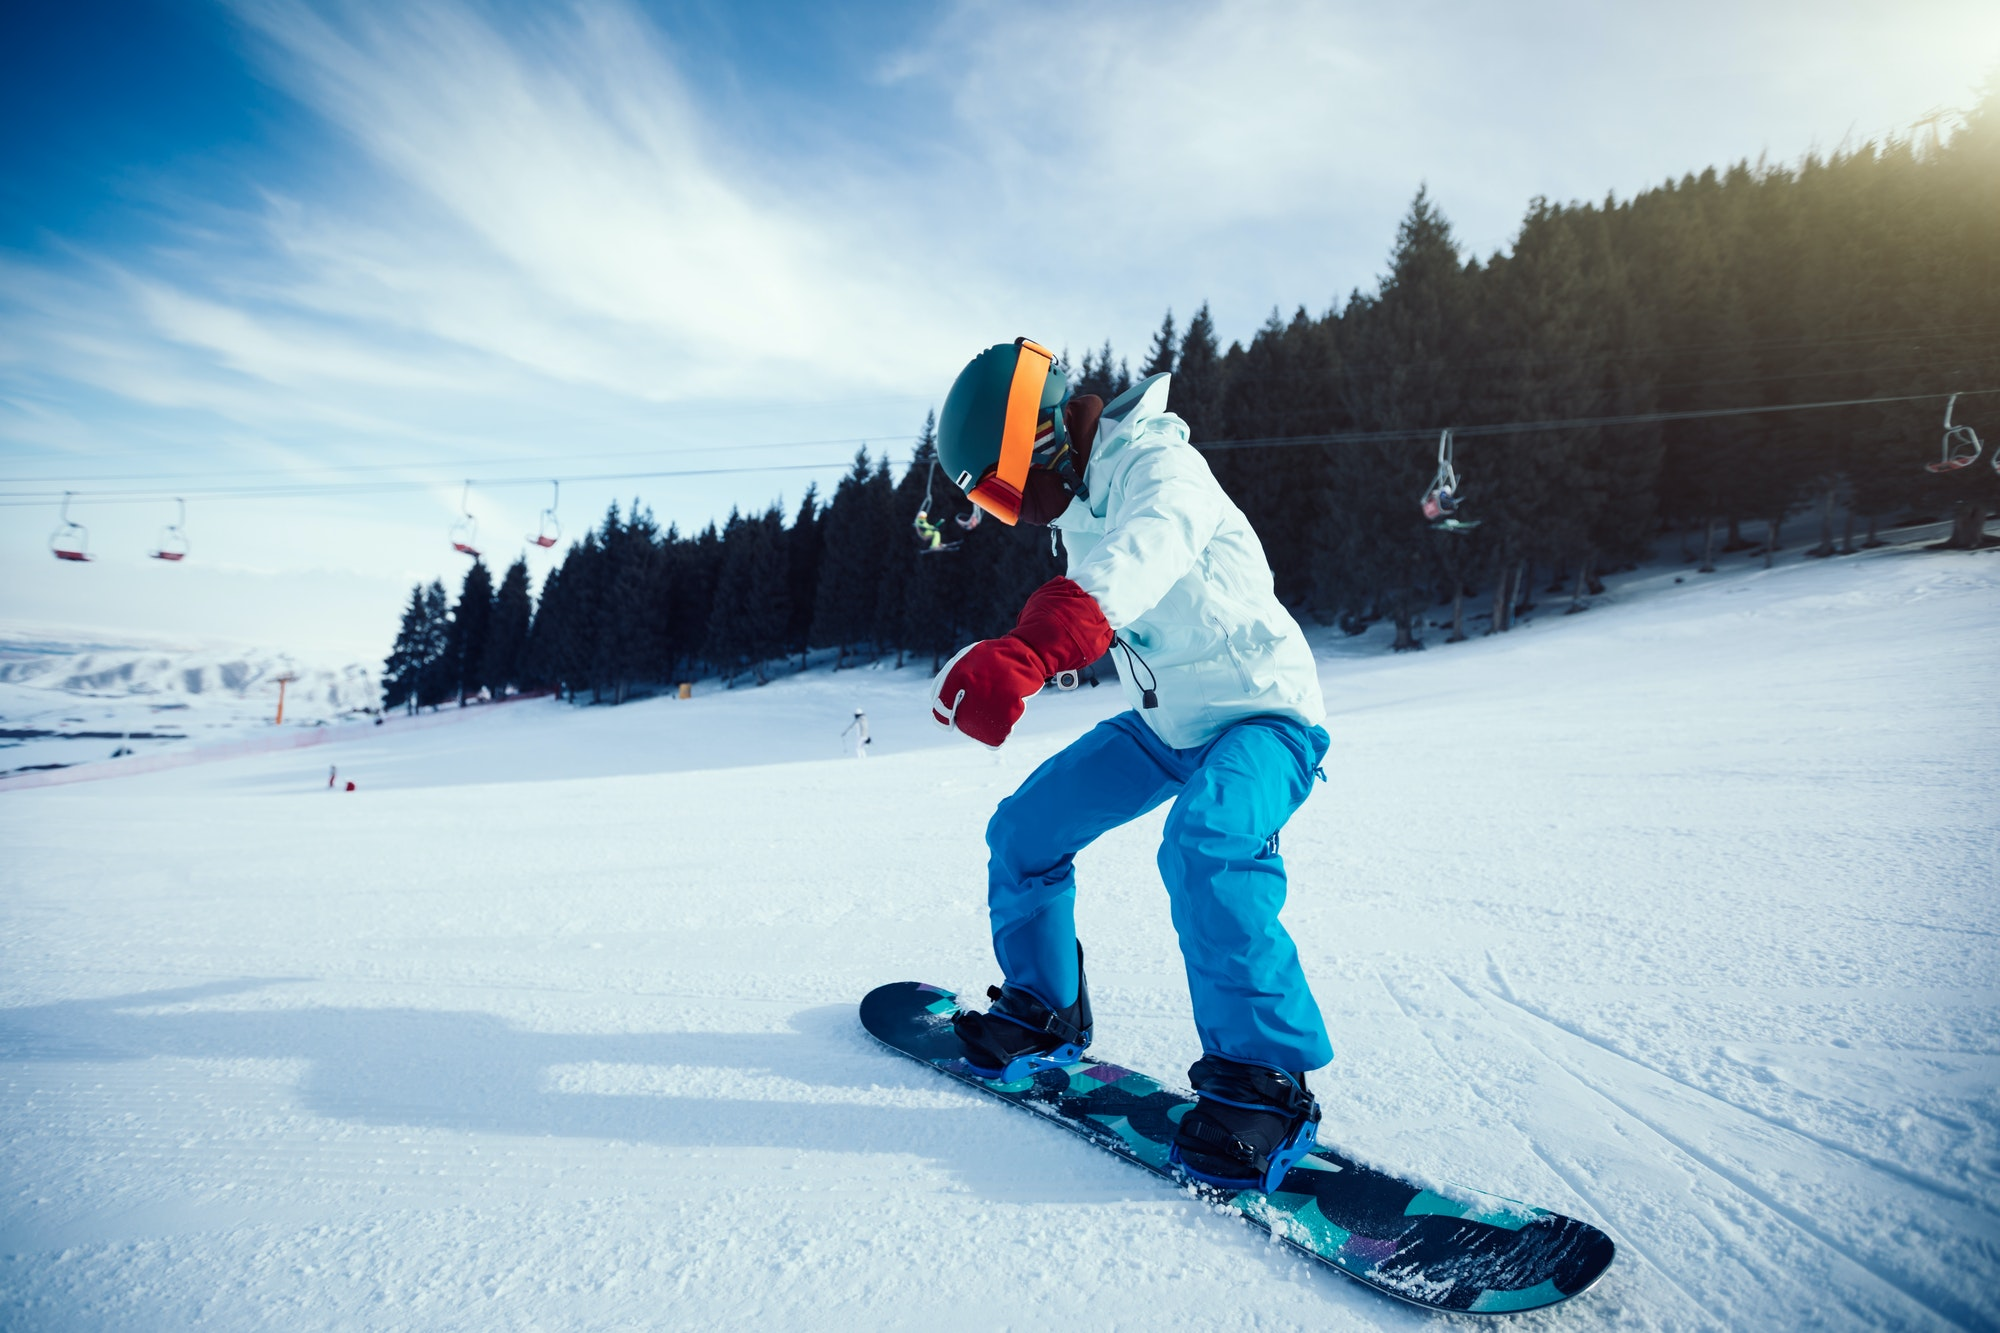 Snowboarding at ski resort